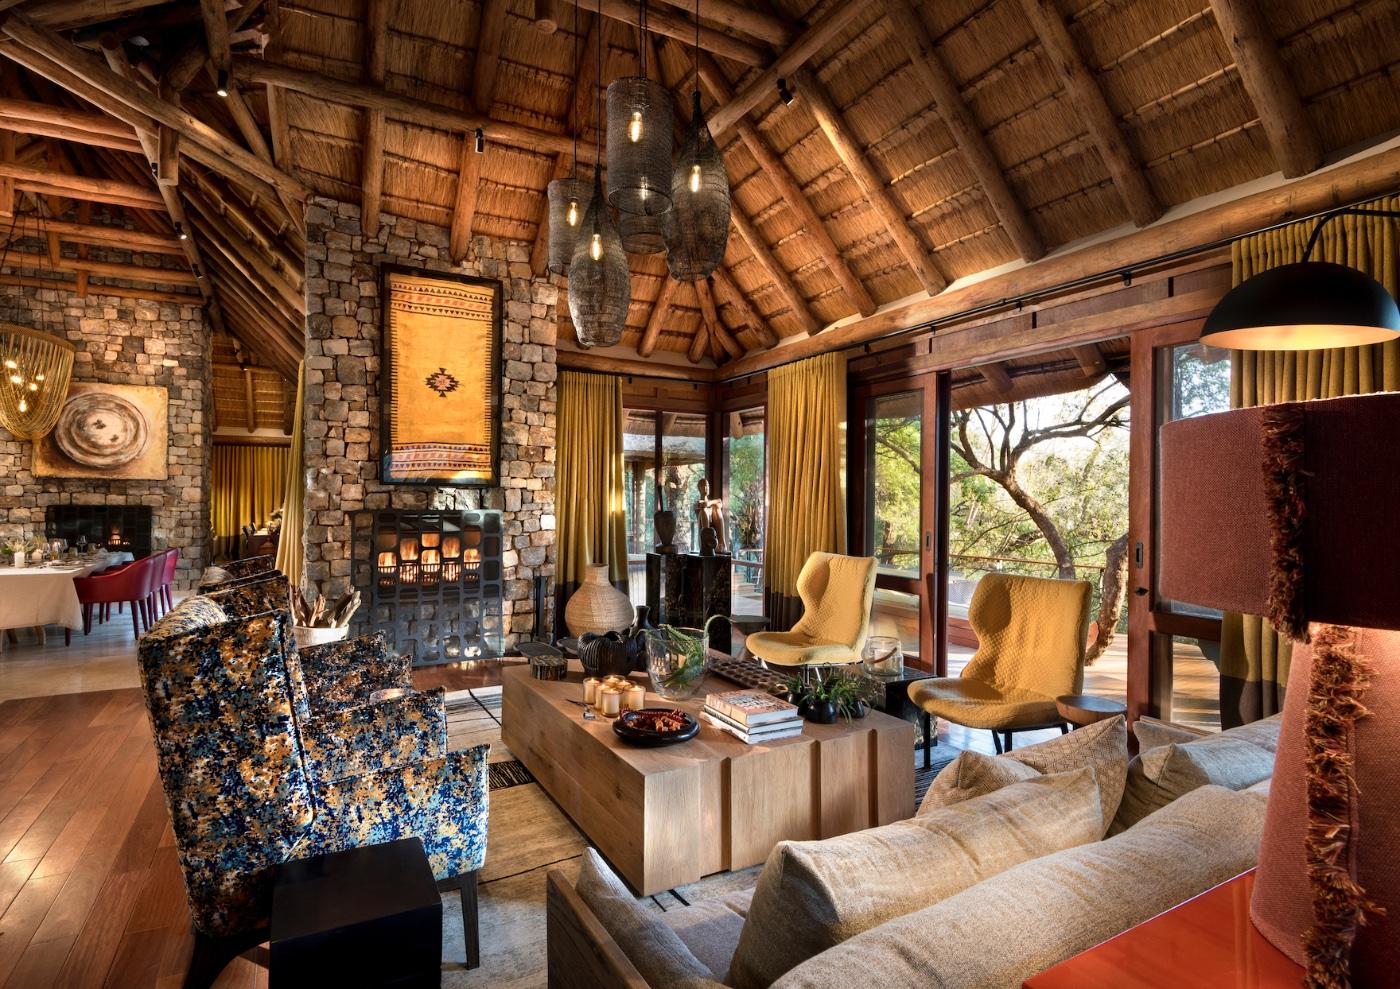 Morukuru, Living Room, Interior design, Decorate, Art, Lounge, Seating, Armchairs, Indoor lighting